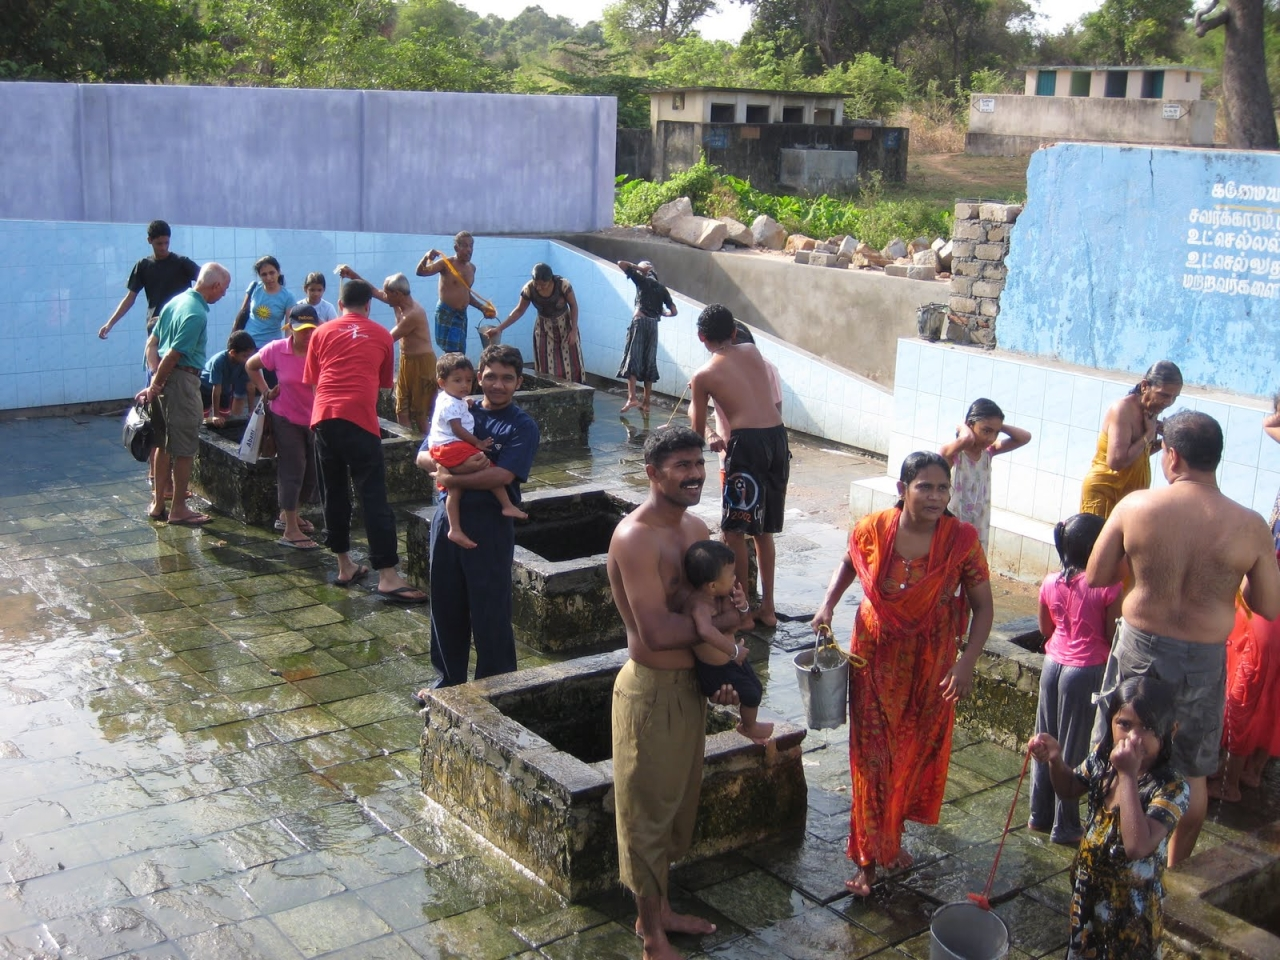 "Kanniya Hotsprings, Trincomalee,Sri Lanka, Photo Credit: <a href=""http://http://miracleisland.wordpress.com/2012/03/29/kanniya-hot-springs-trincomalee/"" shape=""rect"">Miracleisland</a>"